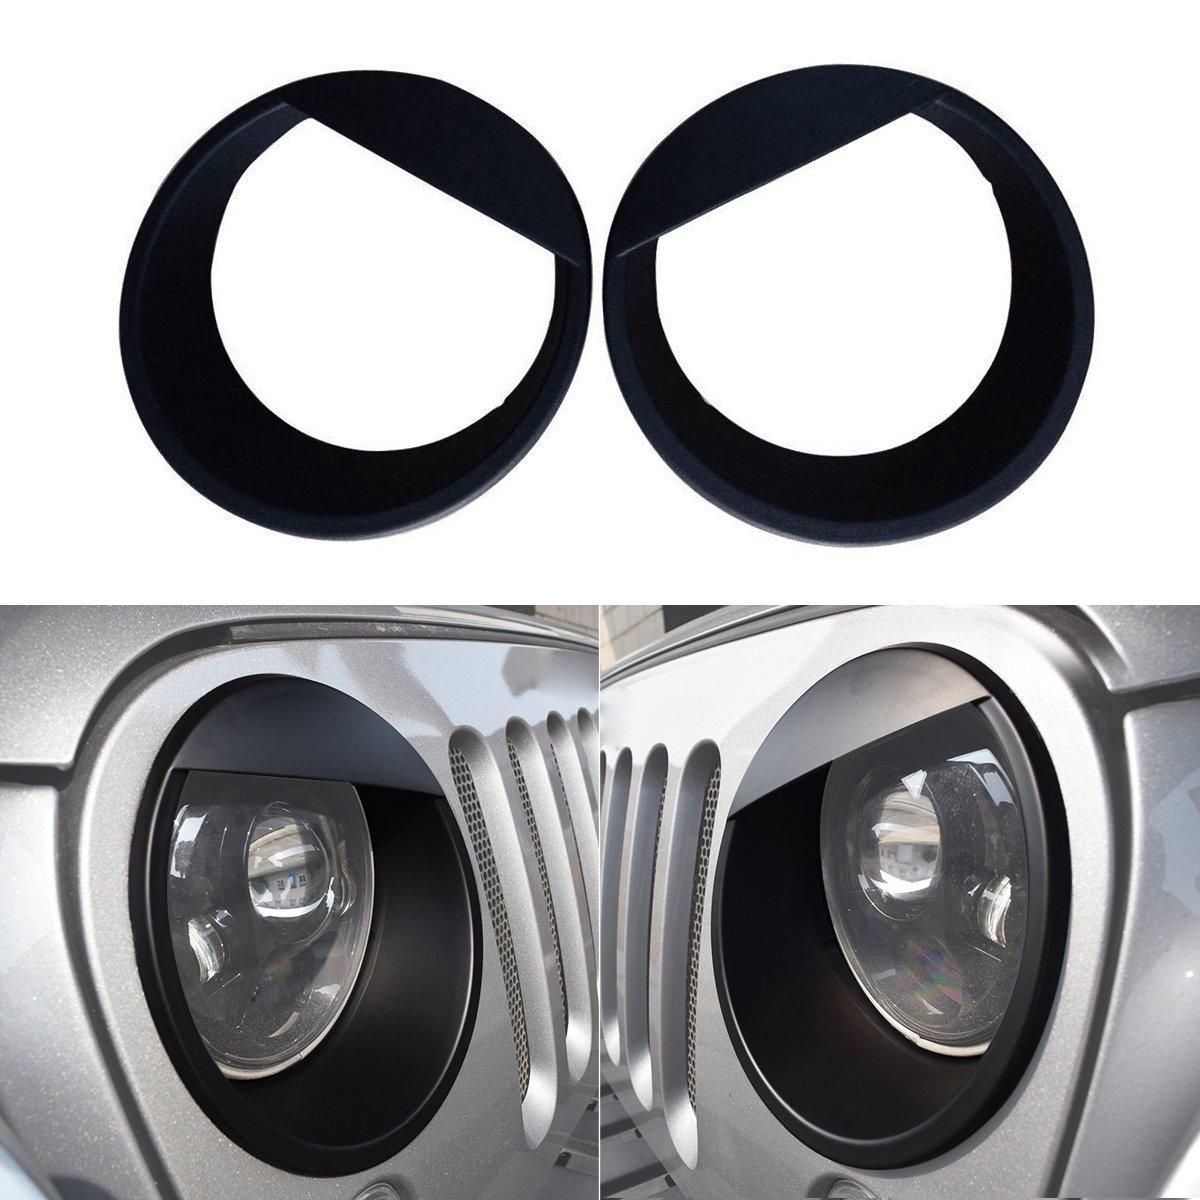 ICarszone ICARS Black Front Headlight Trim Cover Bezels Pair Jeep Wrangler Rubicon Sahara Sport JK Unlimited Accessories 2 Door 4 Door 2007-2018 CarsHome